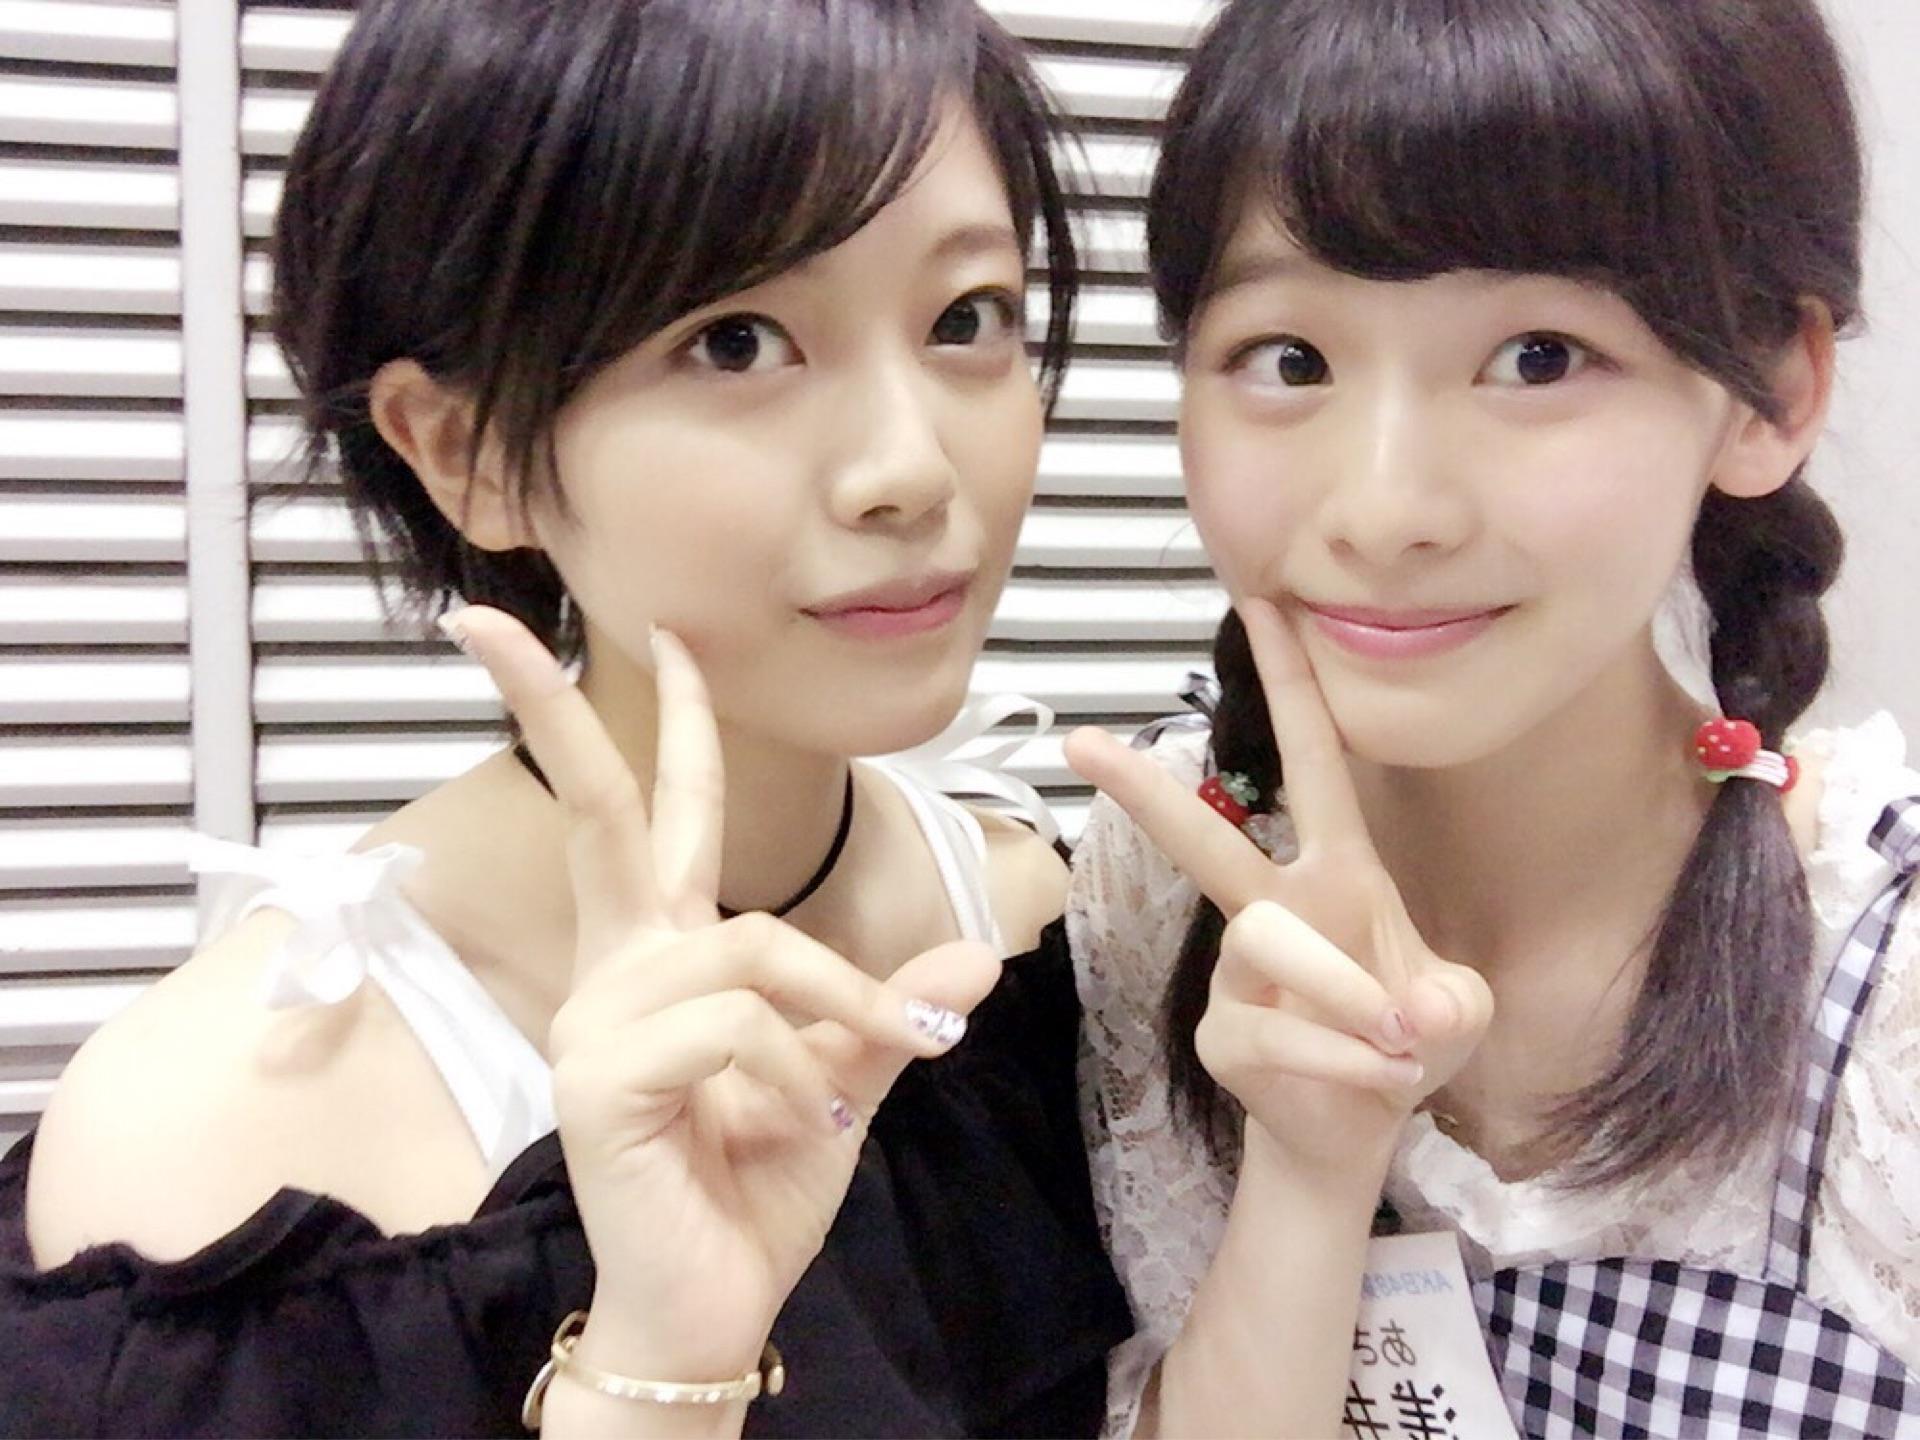 【AKB48 16期研究生】浅井七海応援スレ★1【なーみん】 ©2ch.netYouTube動画>6本 ->画像>165枚